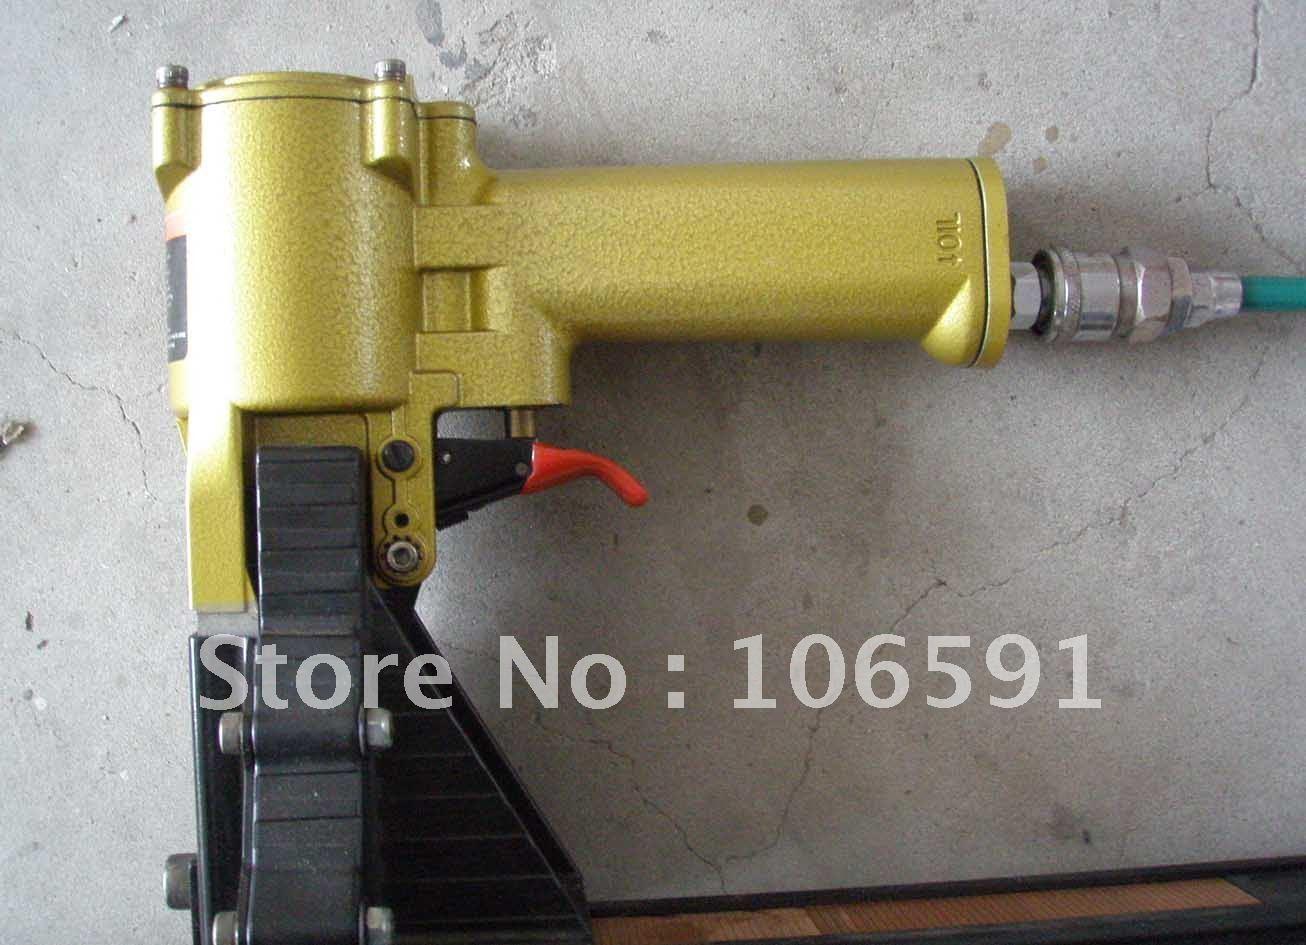 Pneumatic air carton package parcel packing seal machine(China (Mainland))